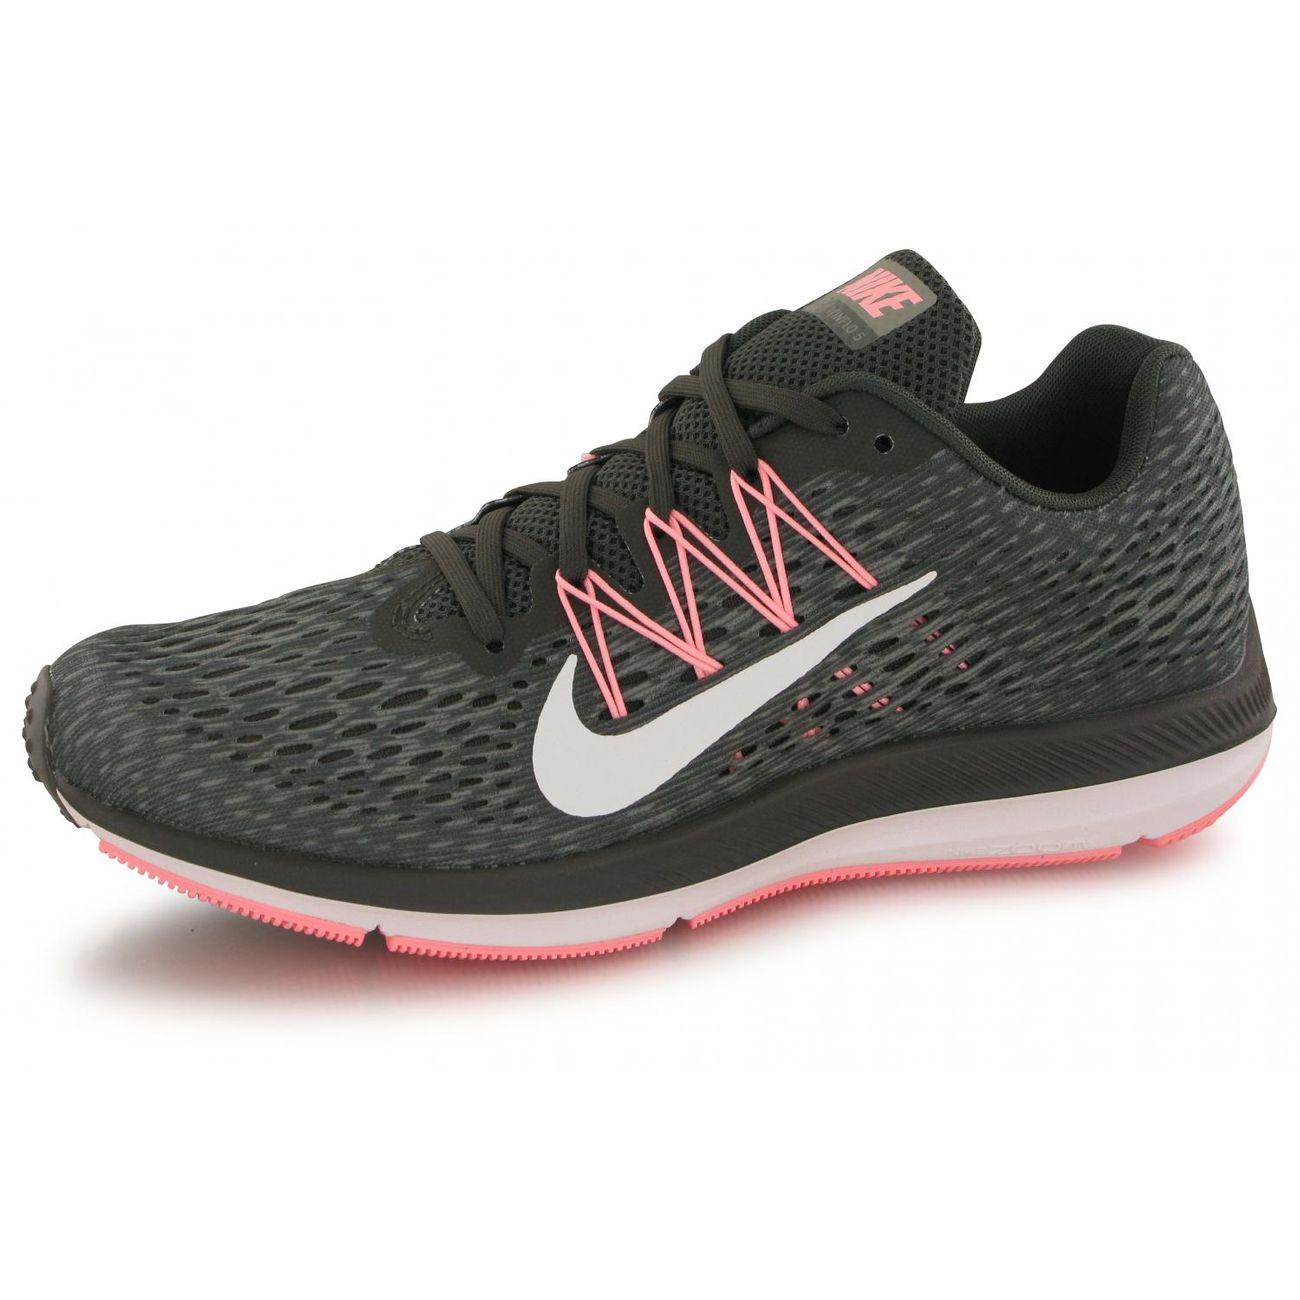 super popular 17192 5c34d running femme NIKE Chaussures Zoom Winflo 5 ...